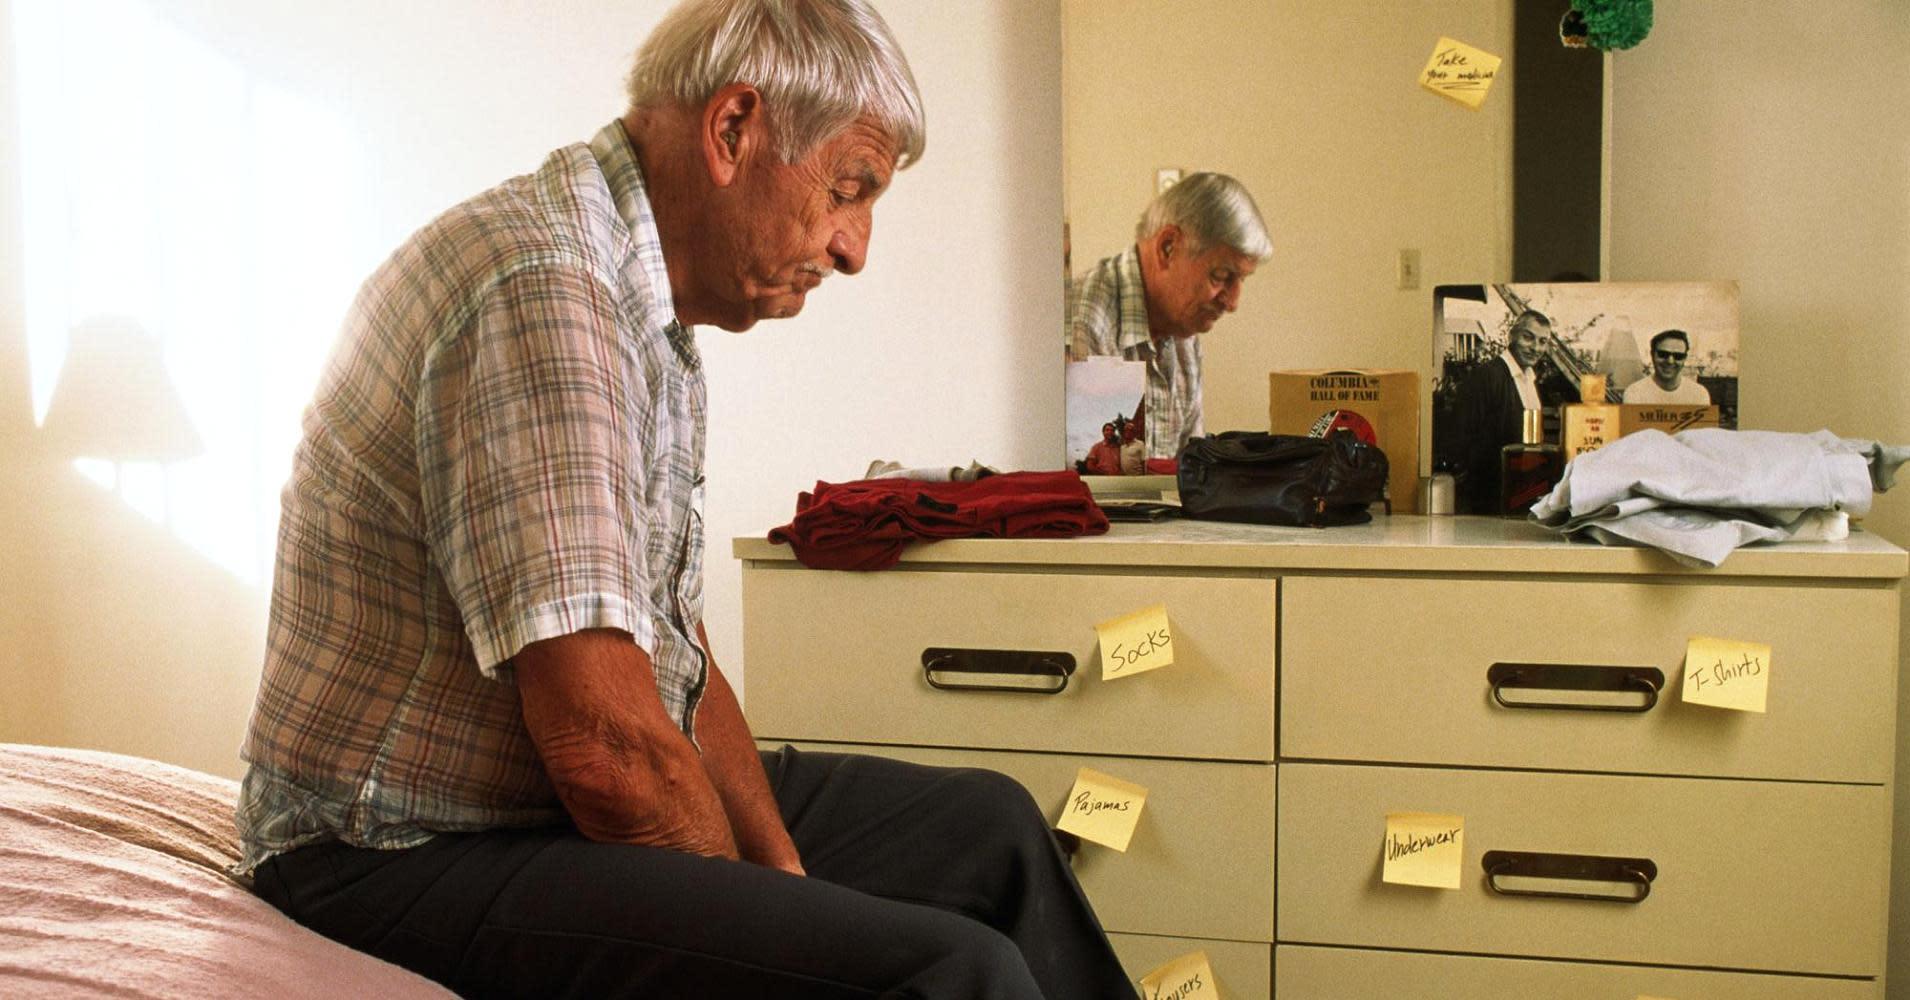 A major step forward in fighting Alzheimer's